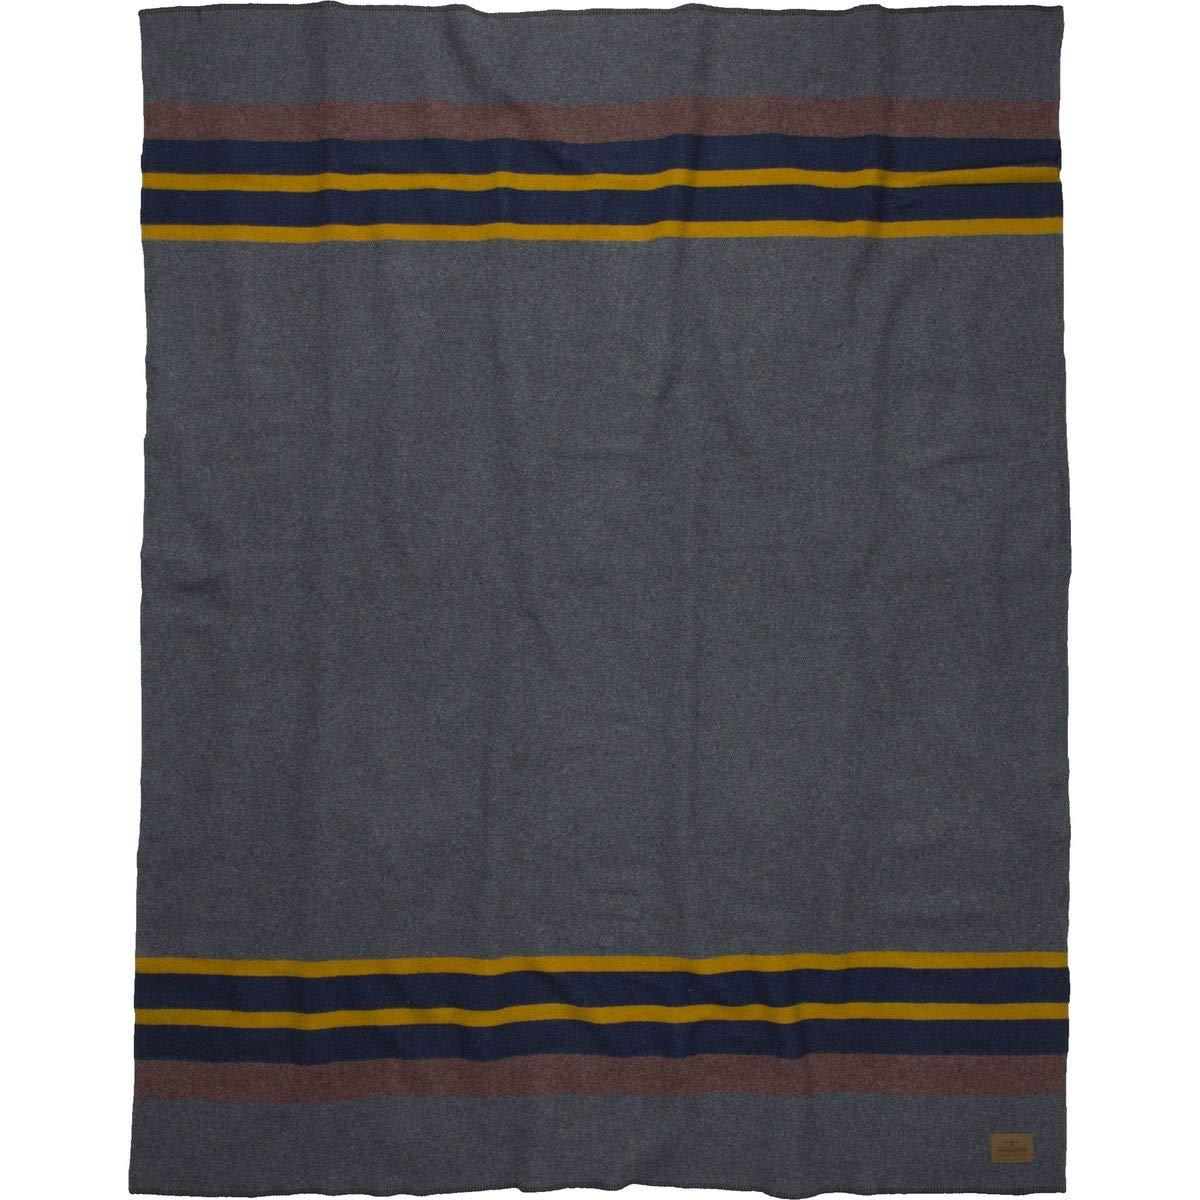 Pendleton キャンプ用毛布 ウール製 掛け布 54X66 ブルー 5945612 B00WH2VI9G